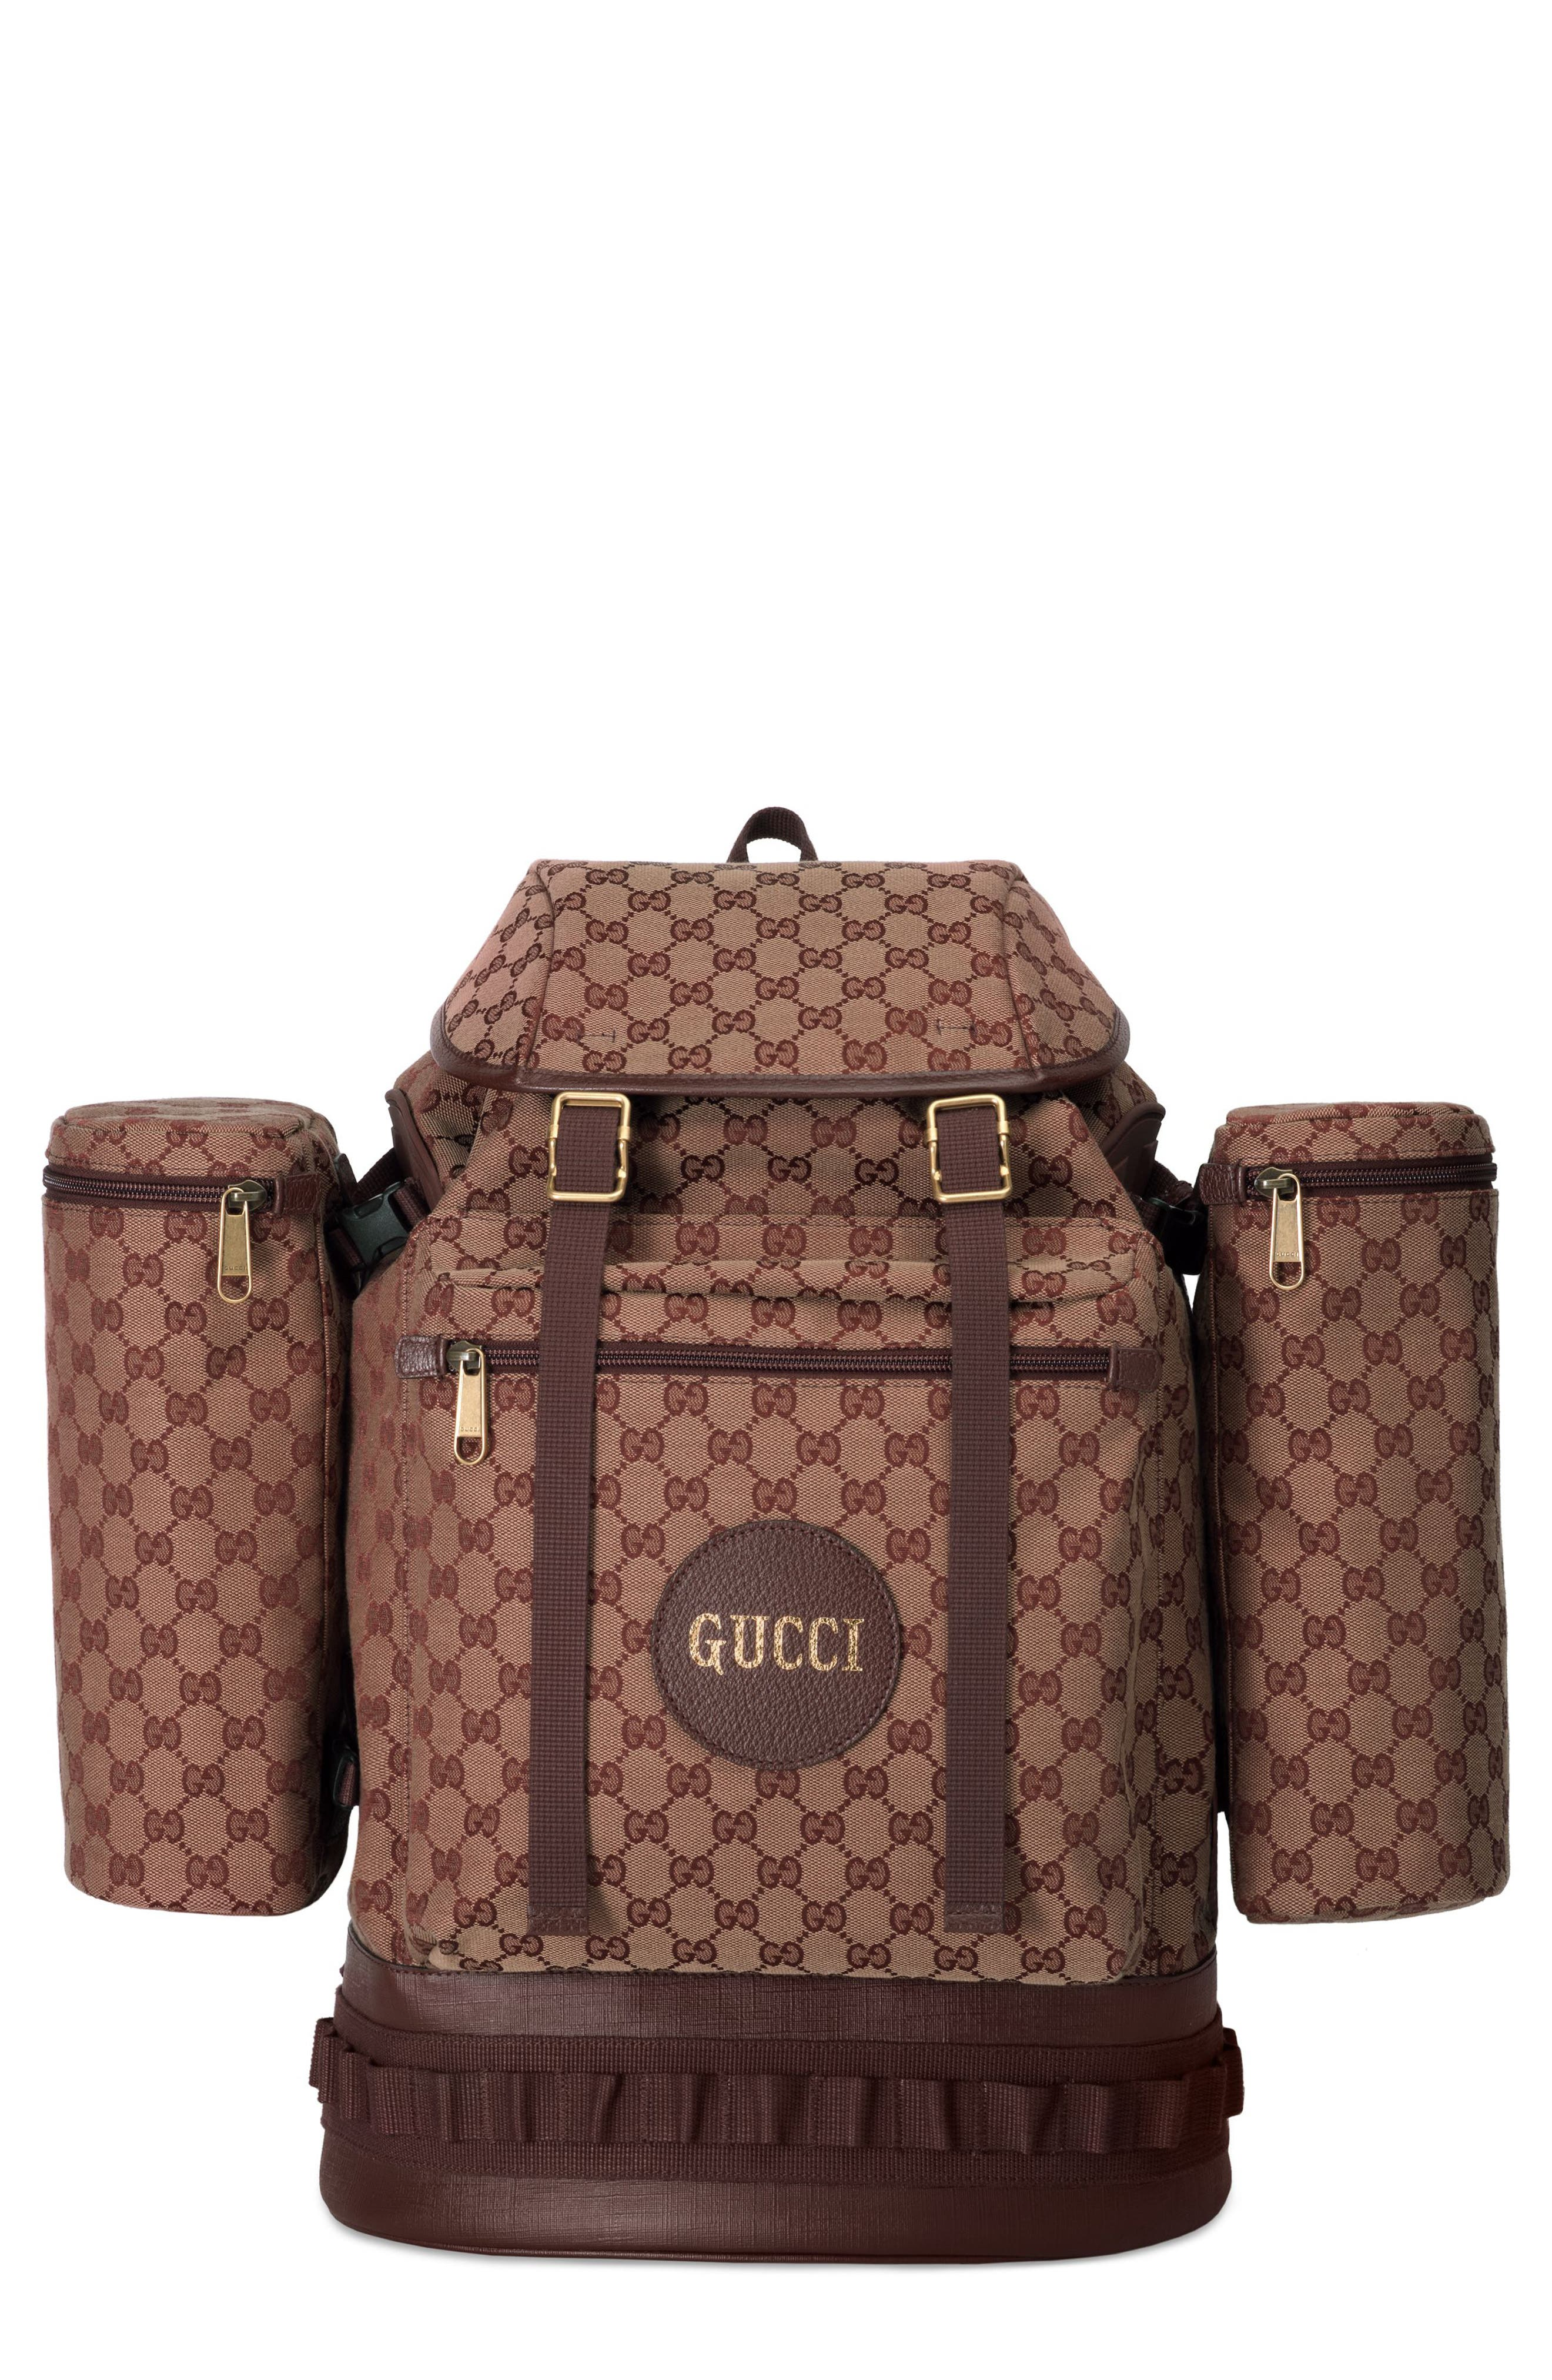 88fc84bfbd4c Men's Gucci Bags & Backpacks | Nordstrom